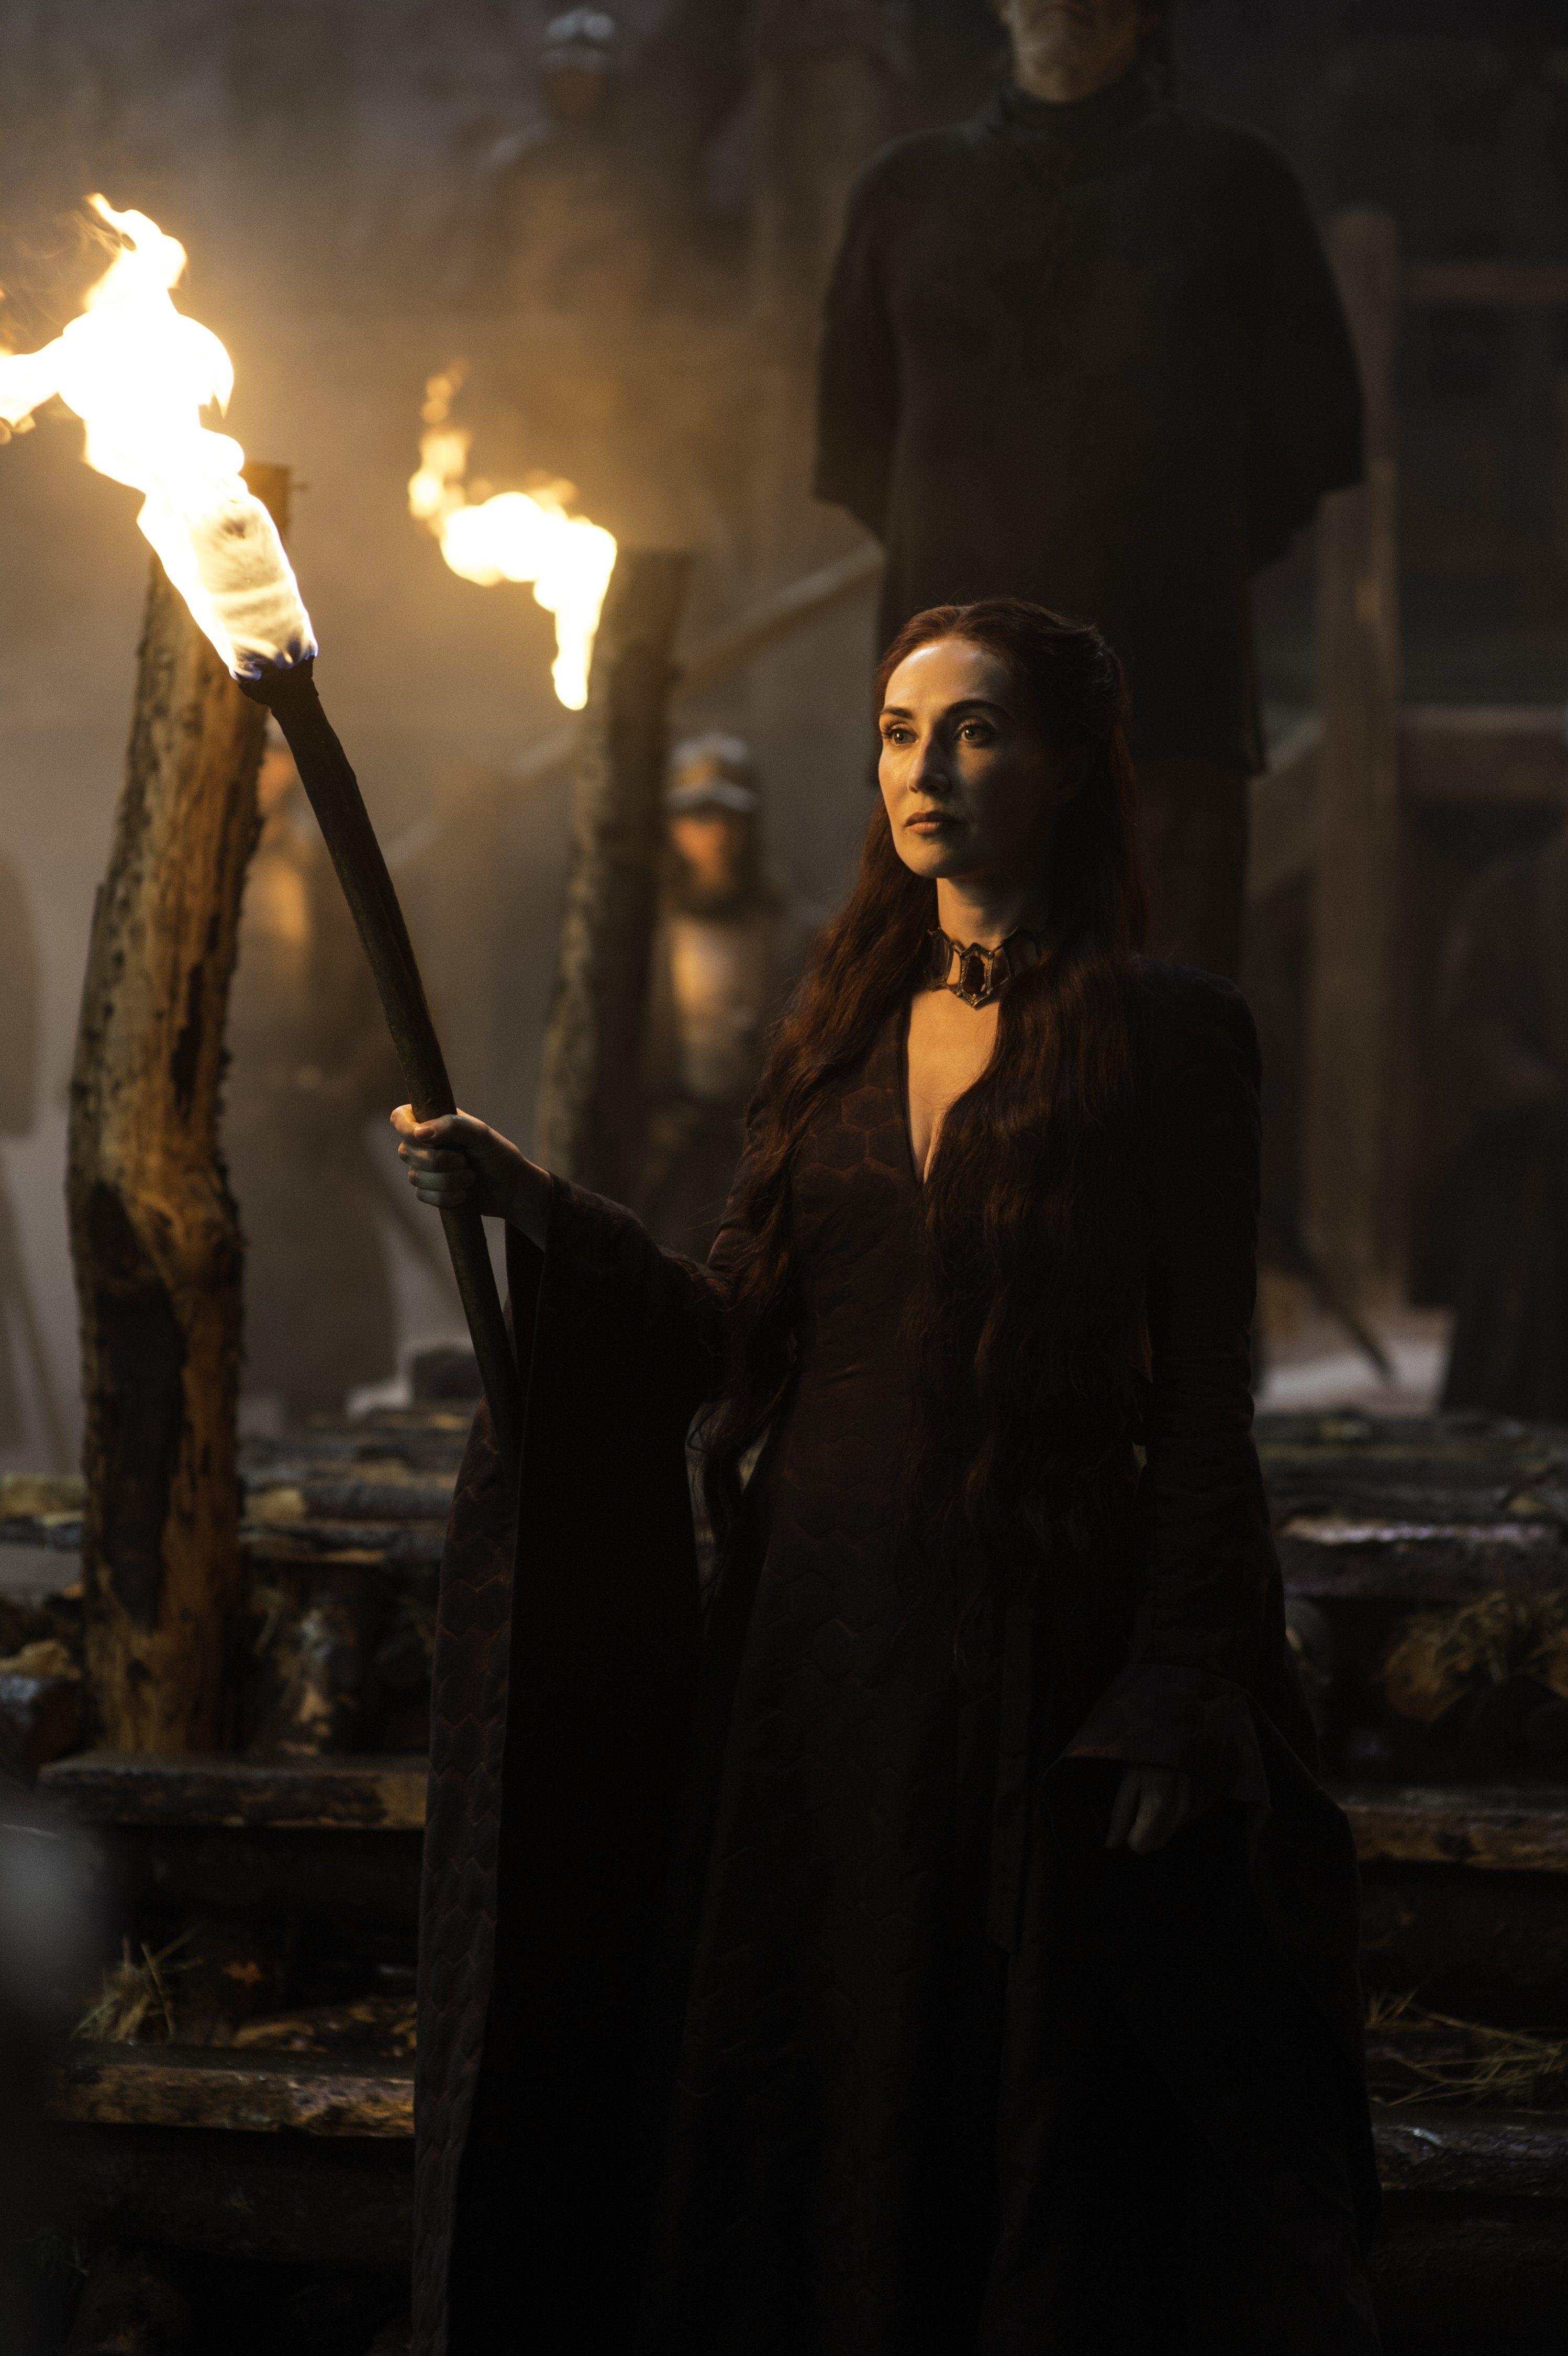 Game of Thrones Season 5 Episode 1 Melisandre, Red